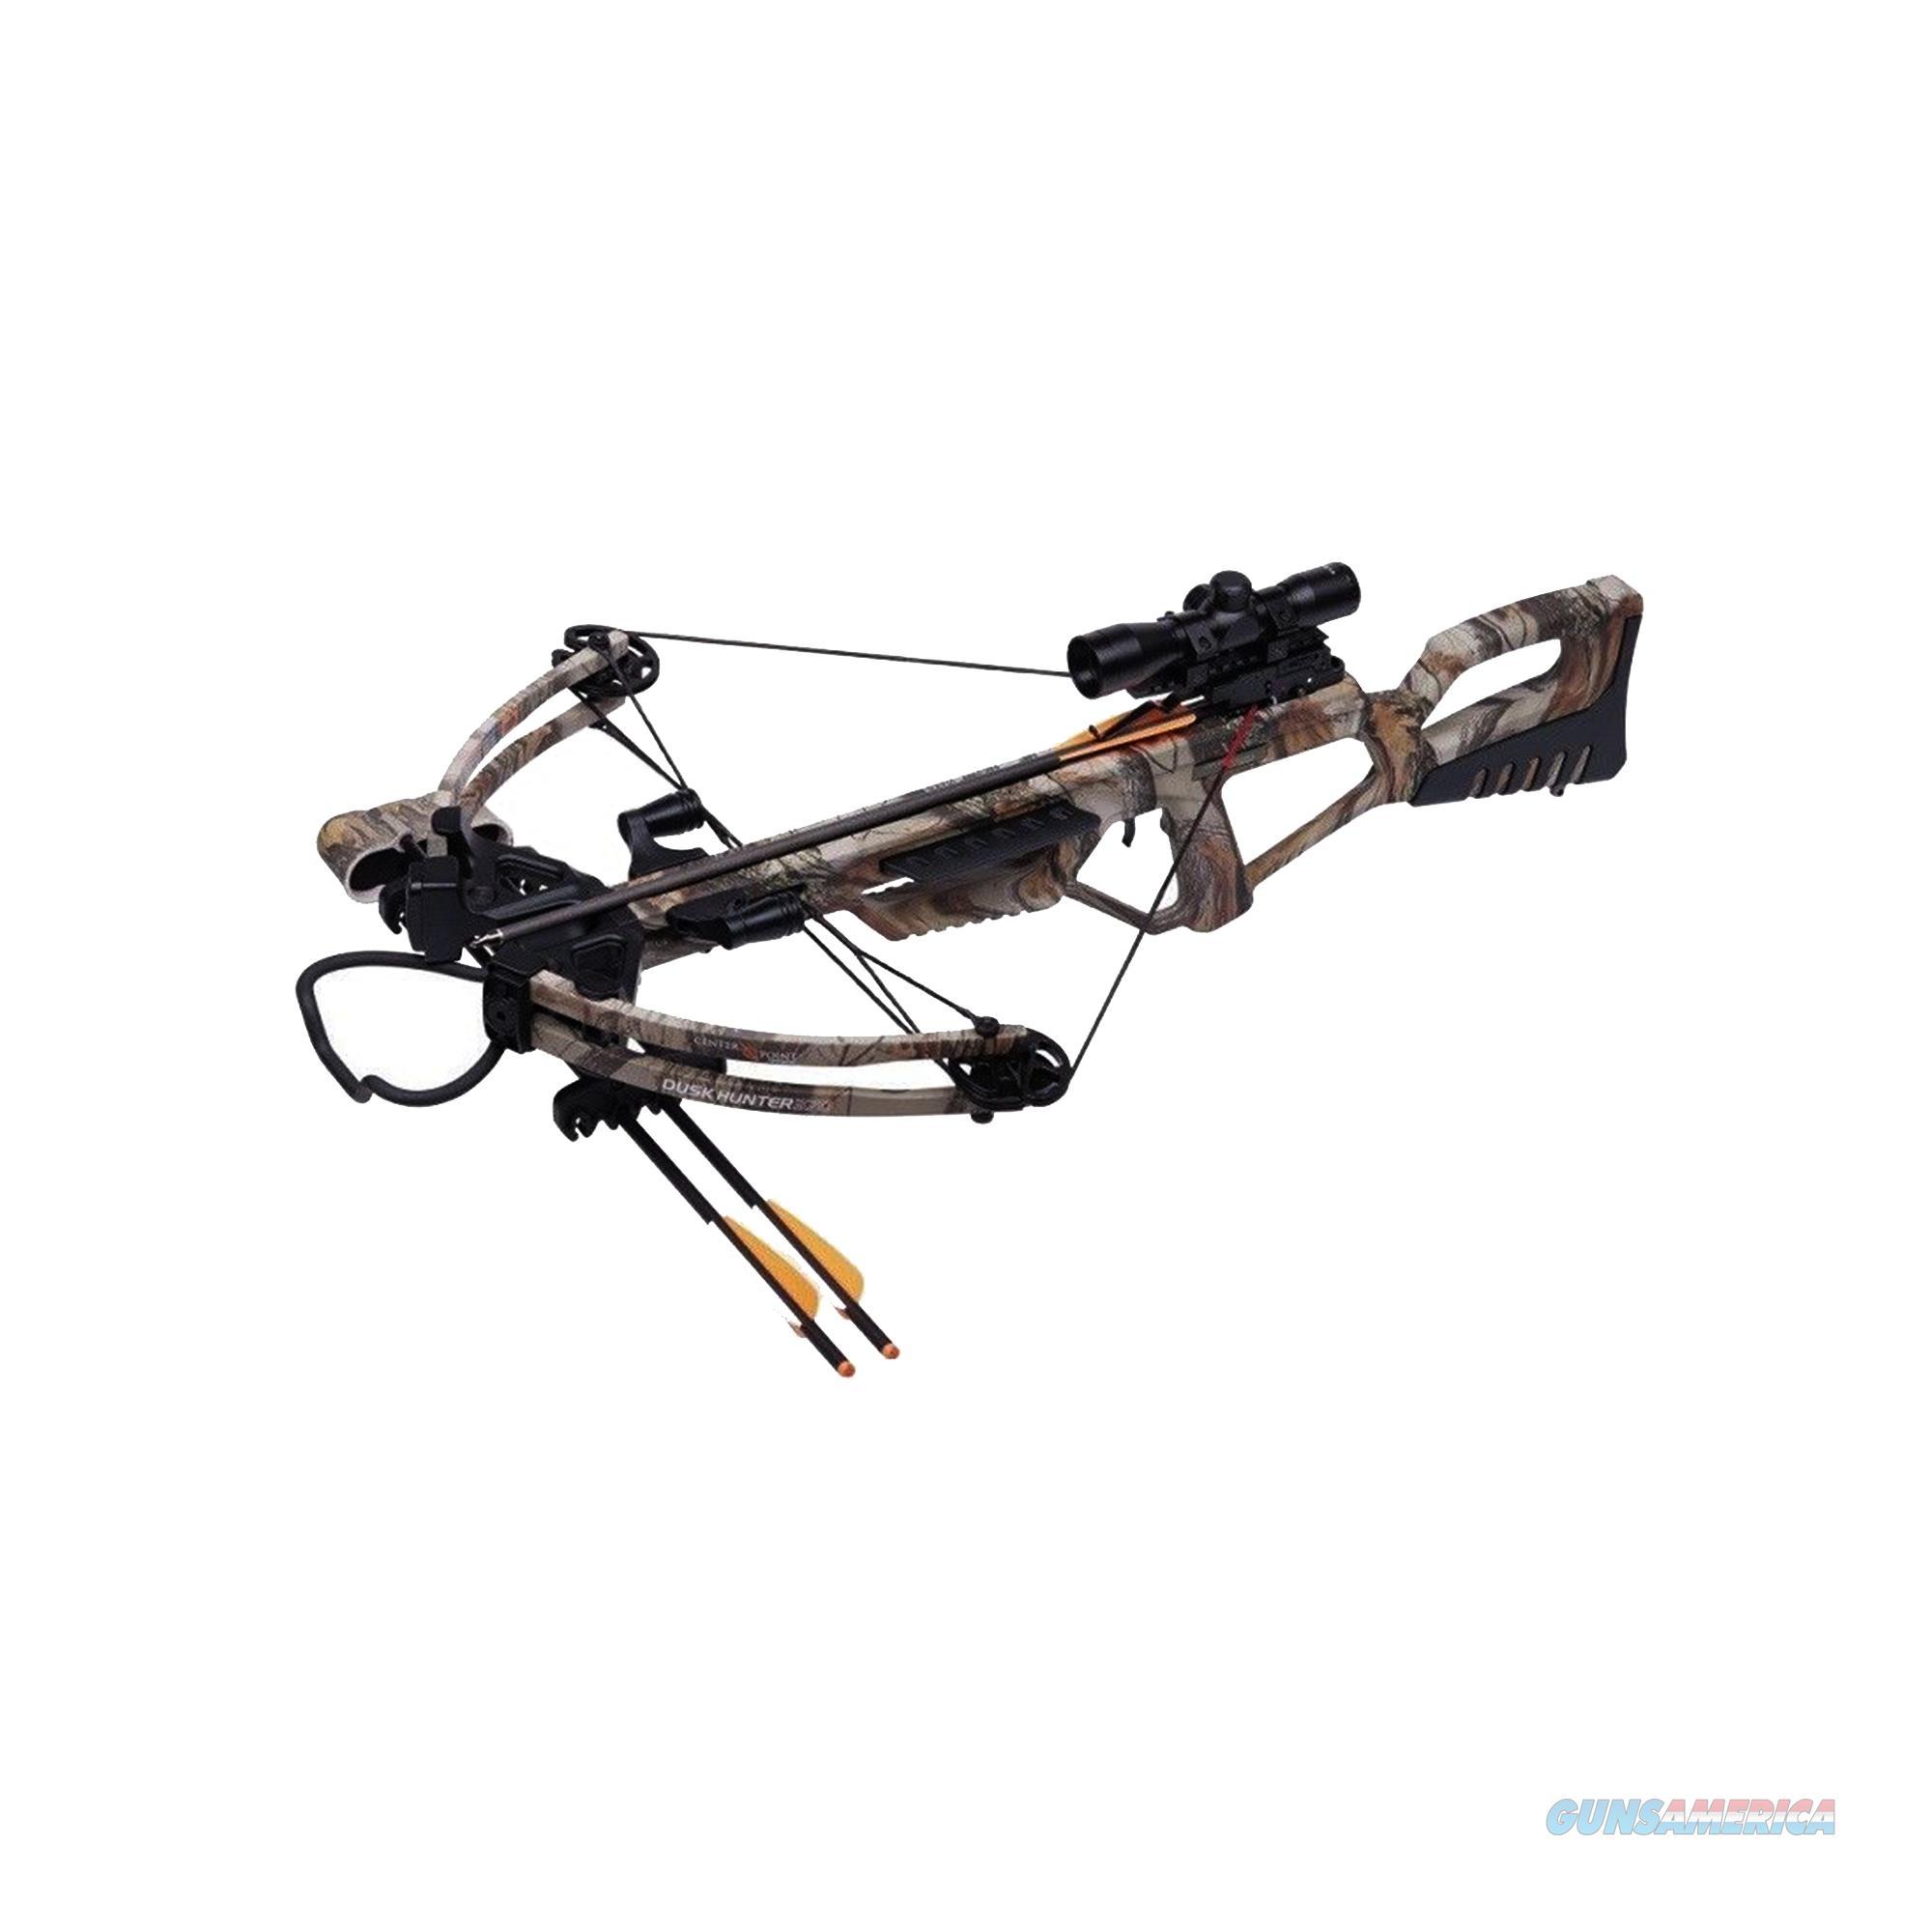 Crosman Dusk Hunter 370 Compound Crossbow AXCDH185CK  Non-Guns > Archery > Bows > Crossbows